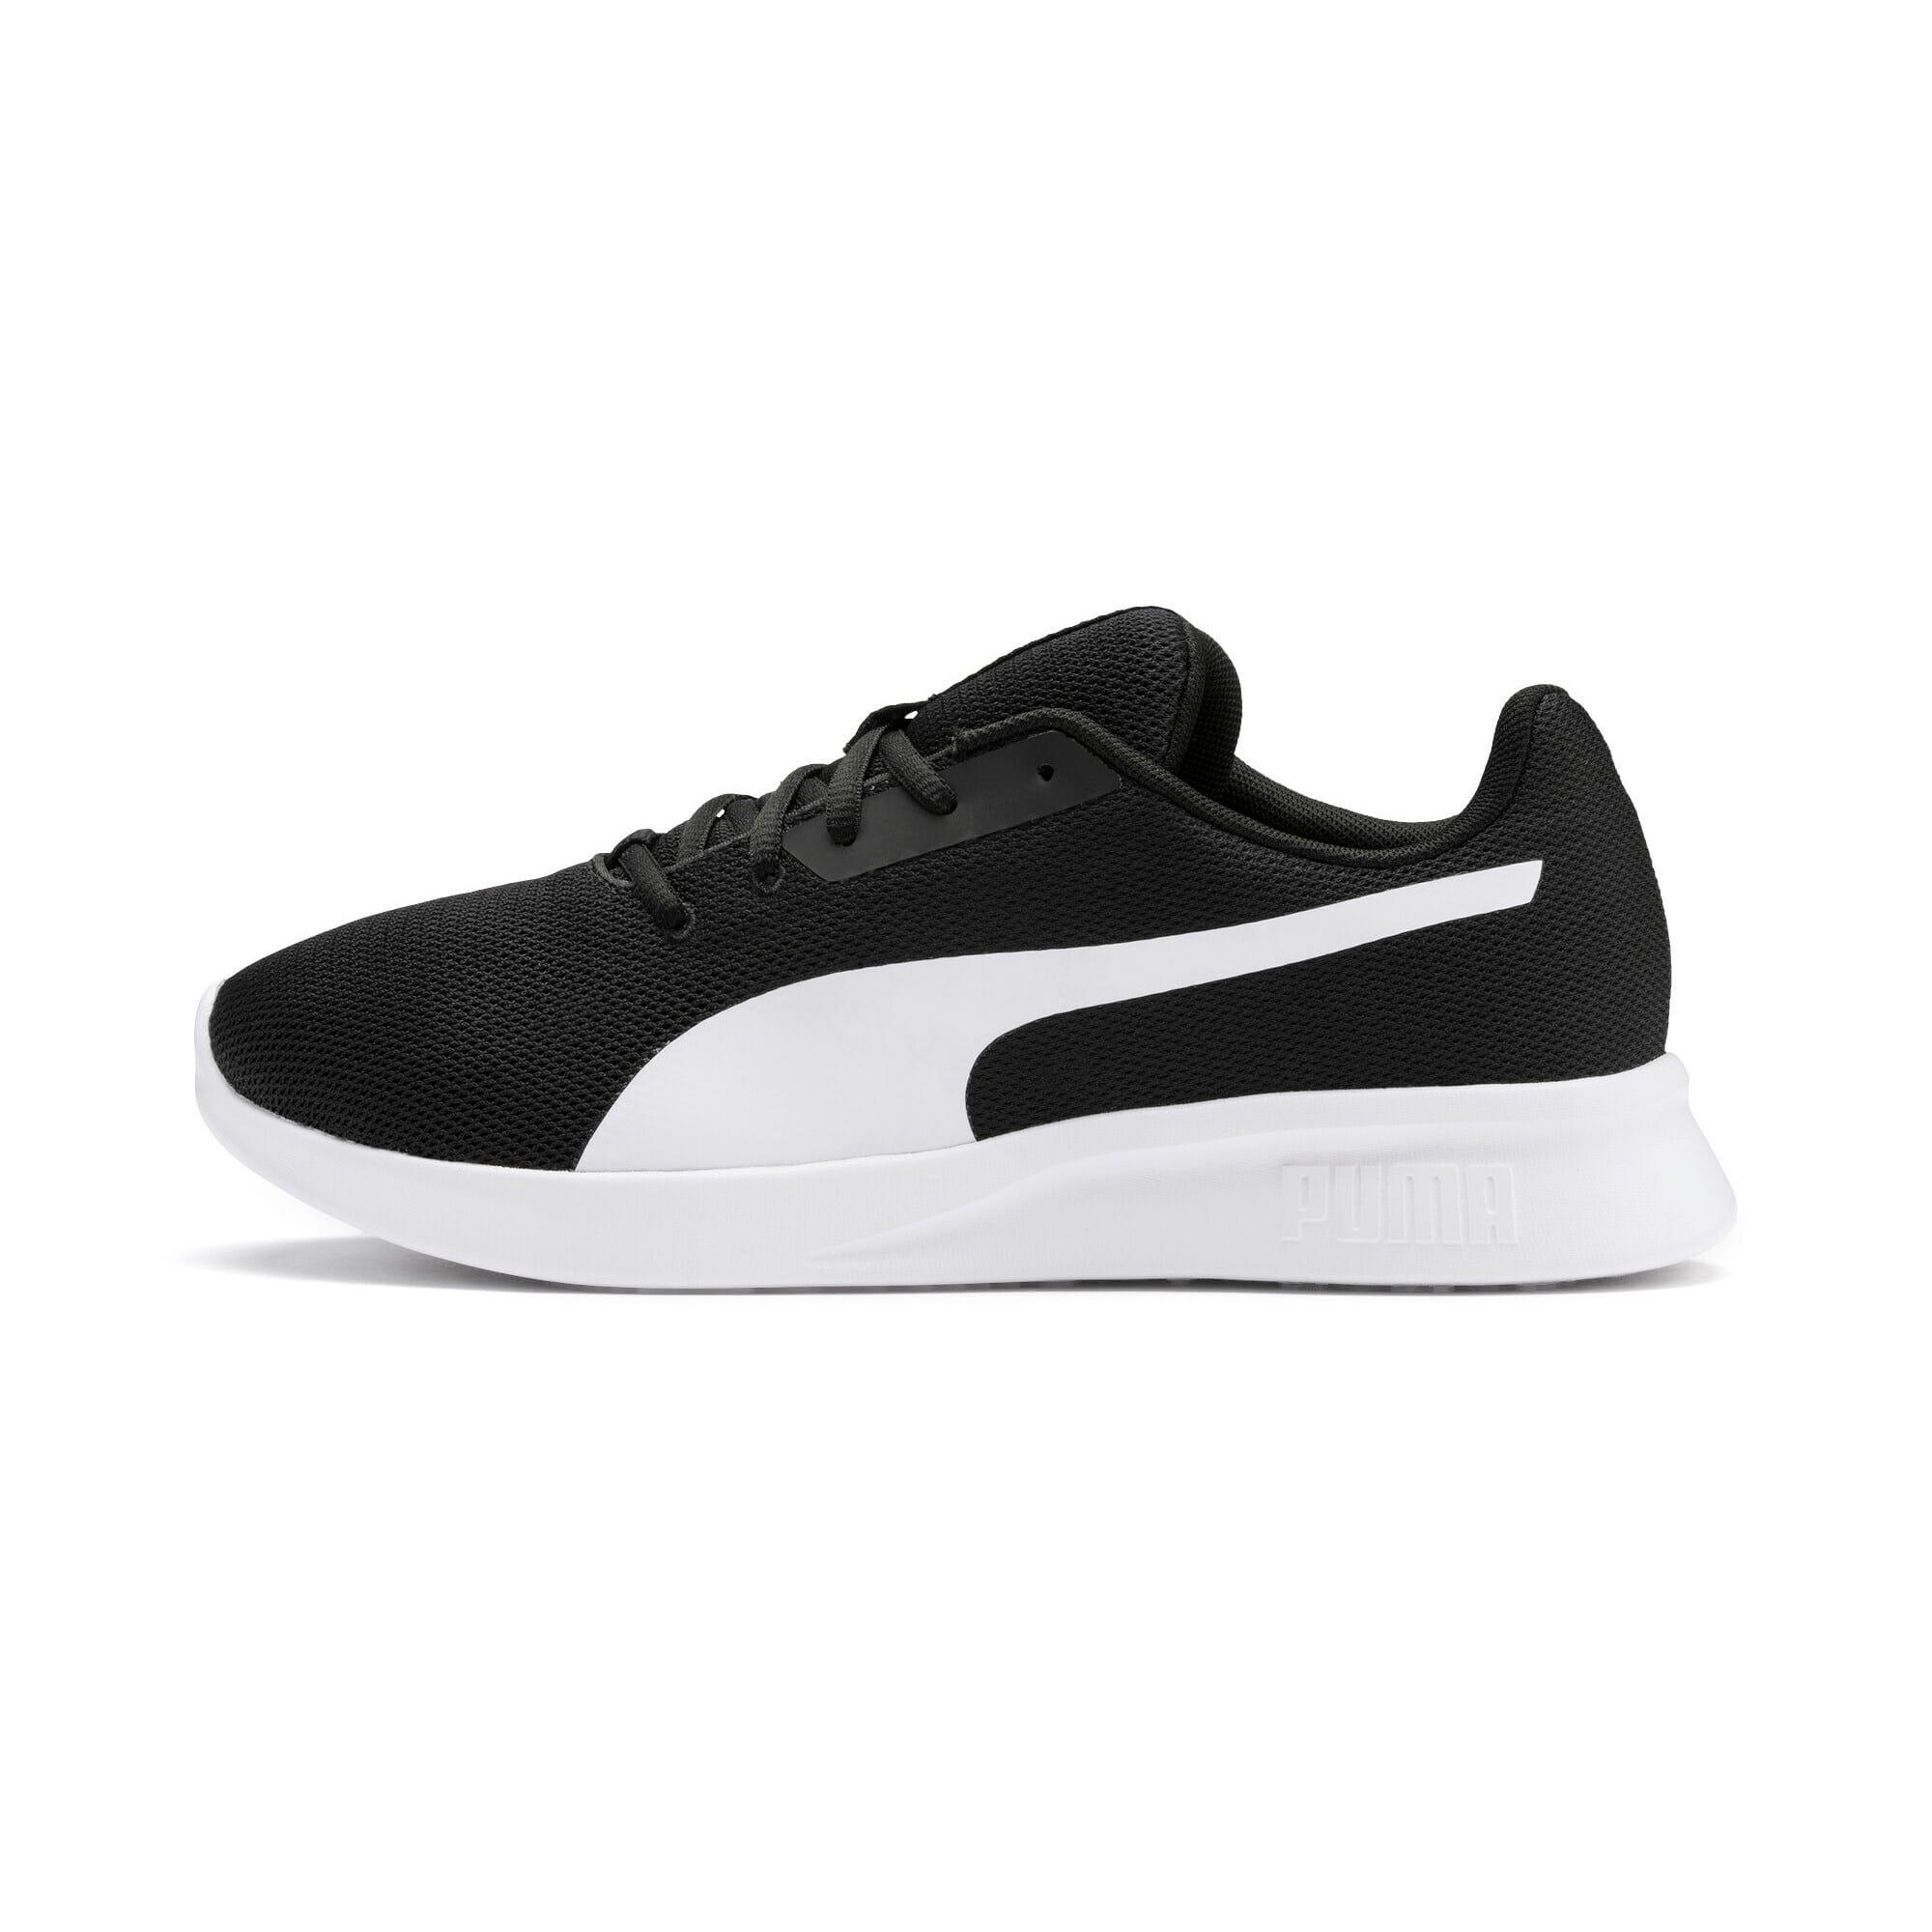 Thumbnail 1 of Modern Runner Sneakers, Puma Black-Puma White, medium-IND